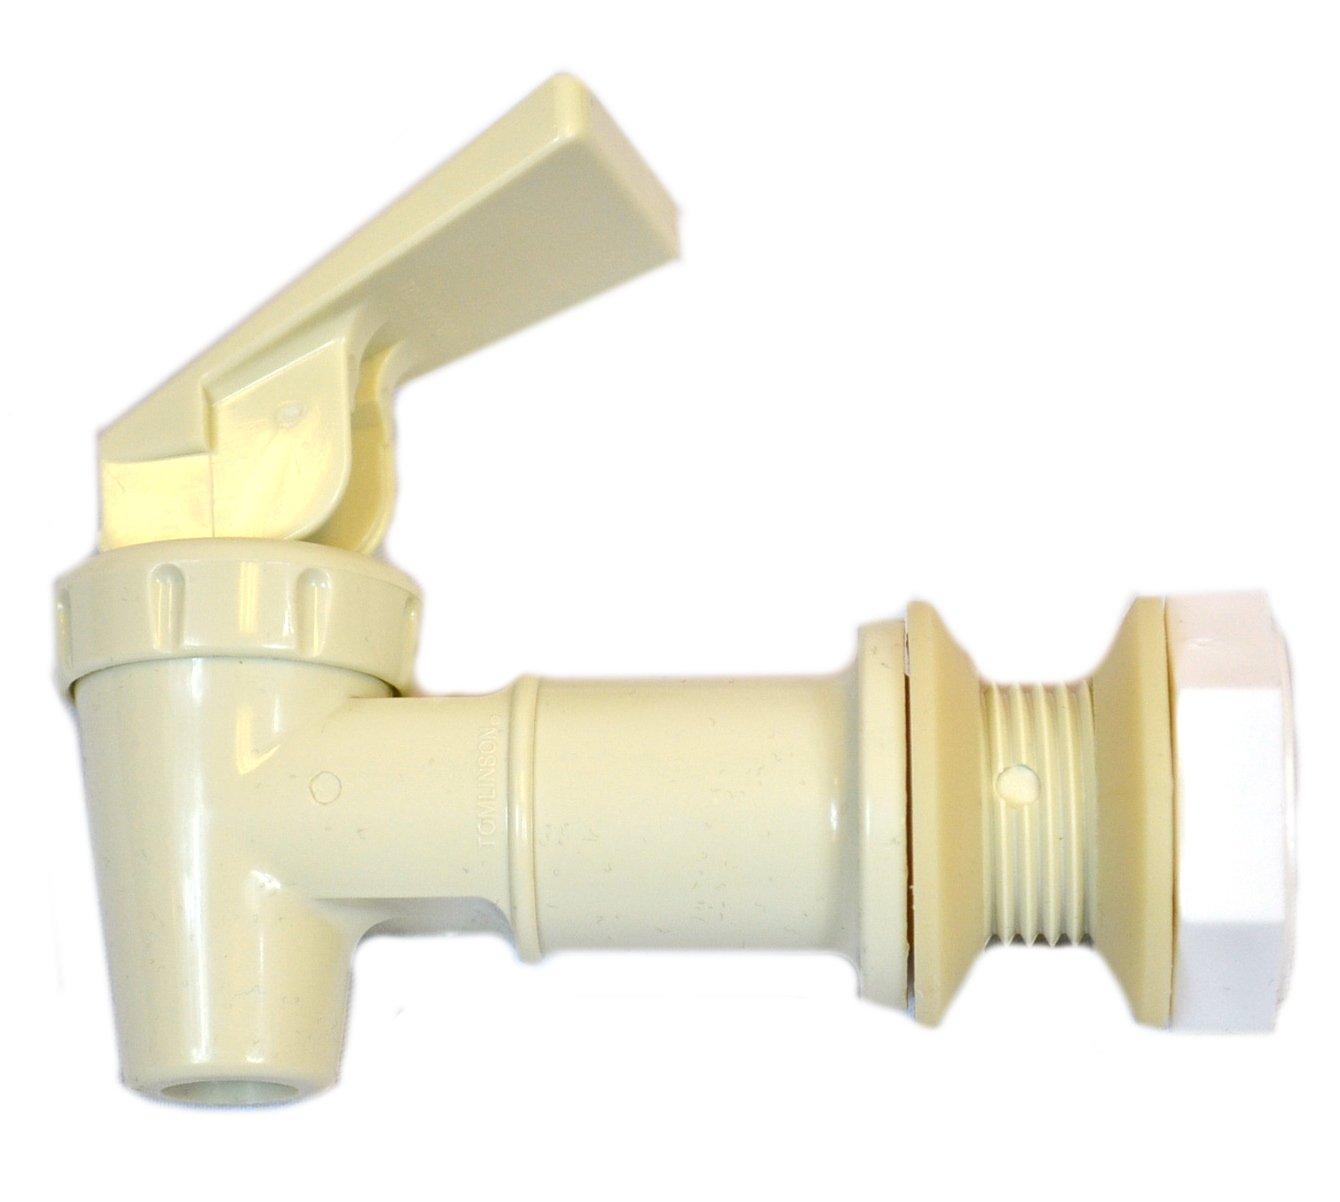 Tomlinson 1018852 Ceramic Crock Lever Faucet - Biege: Amazon.com ...